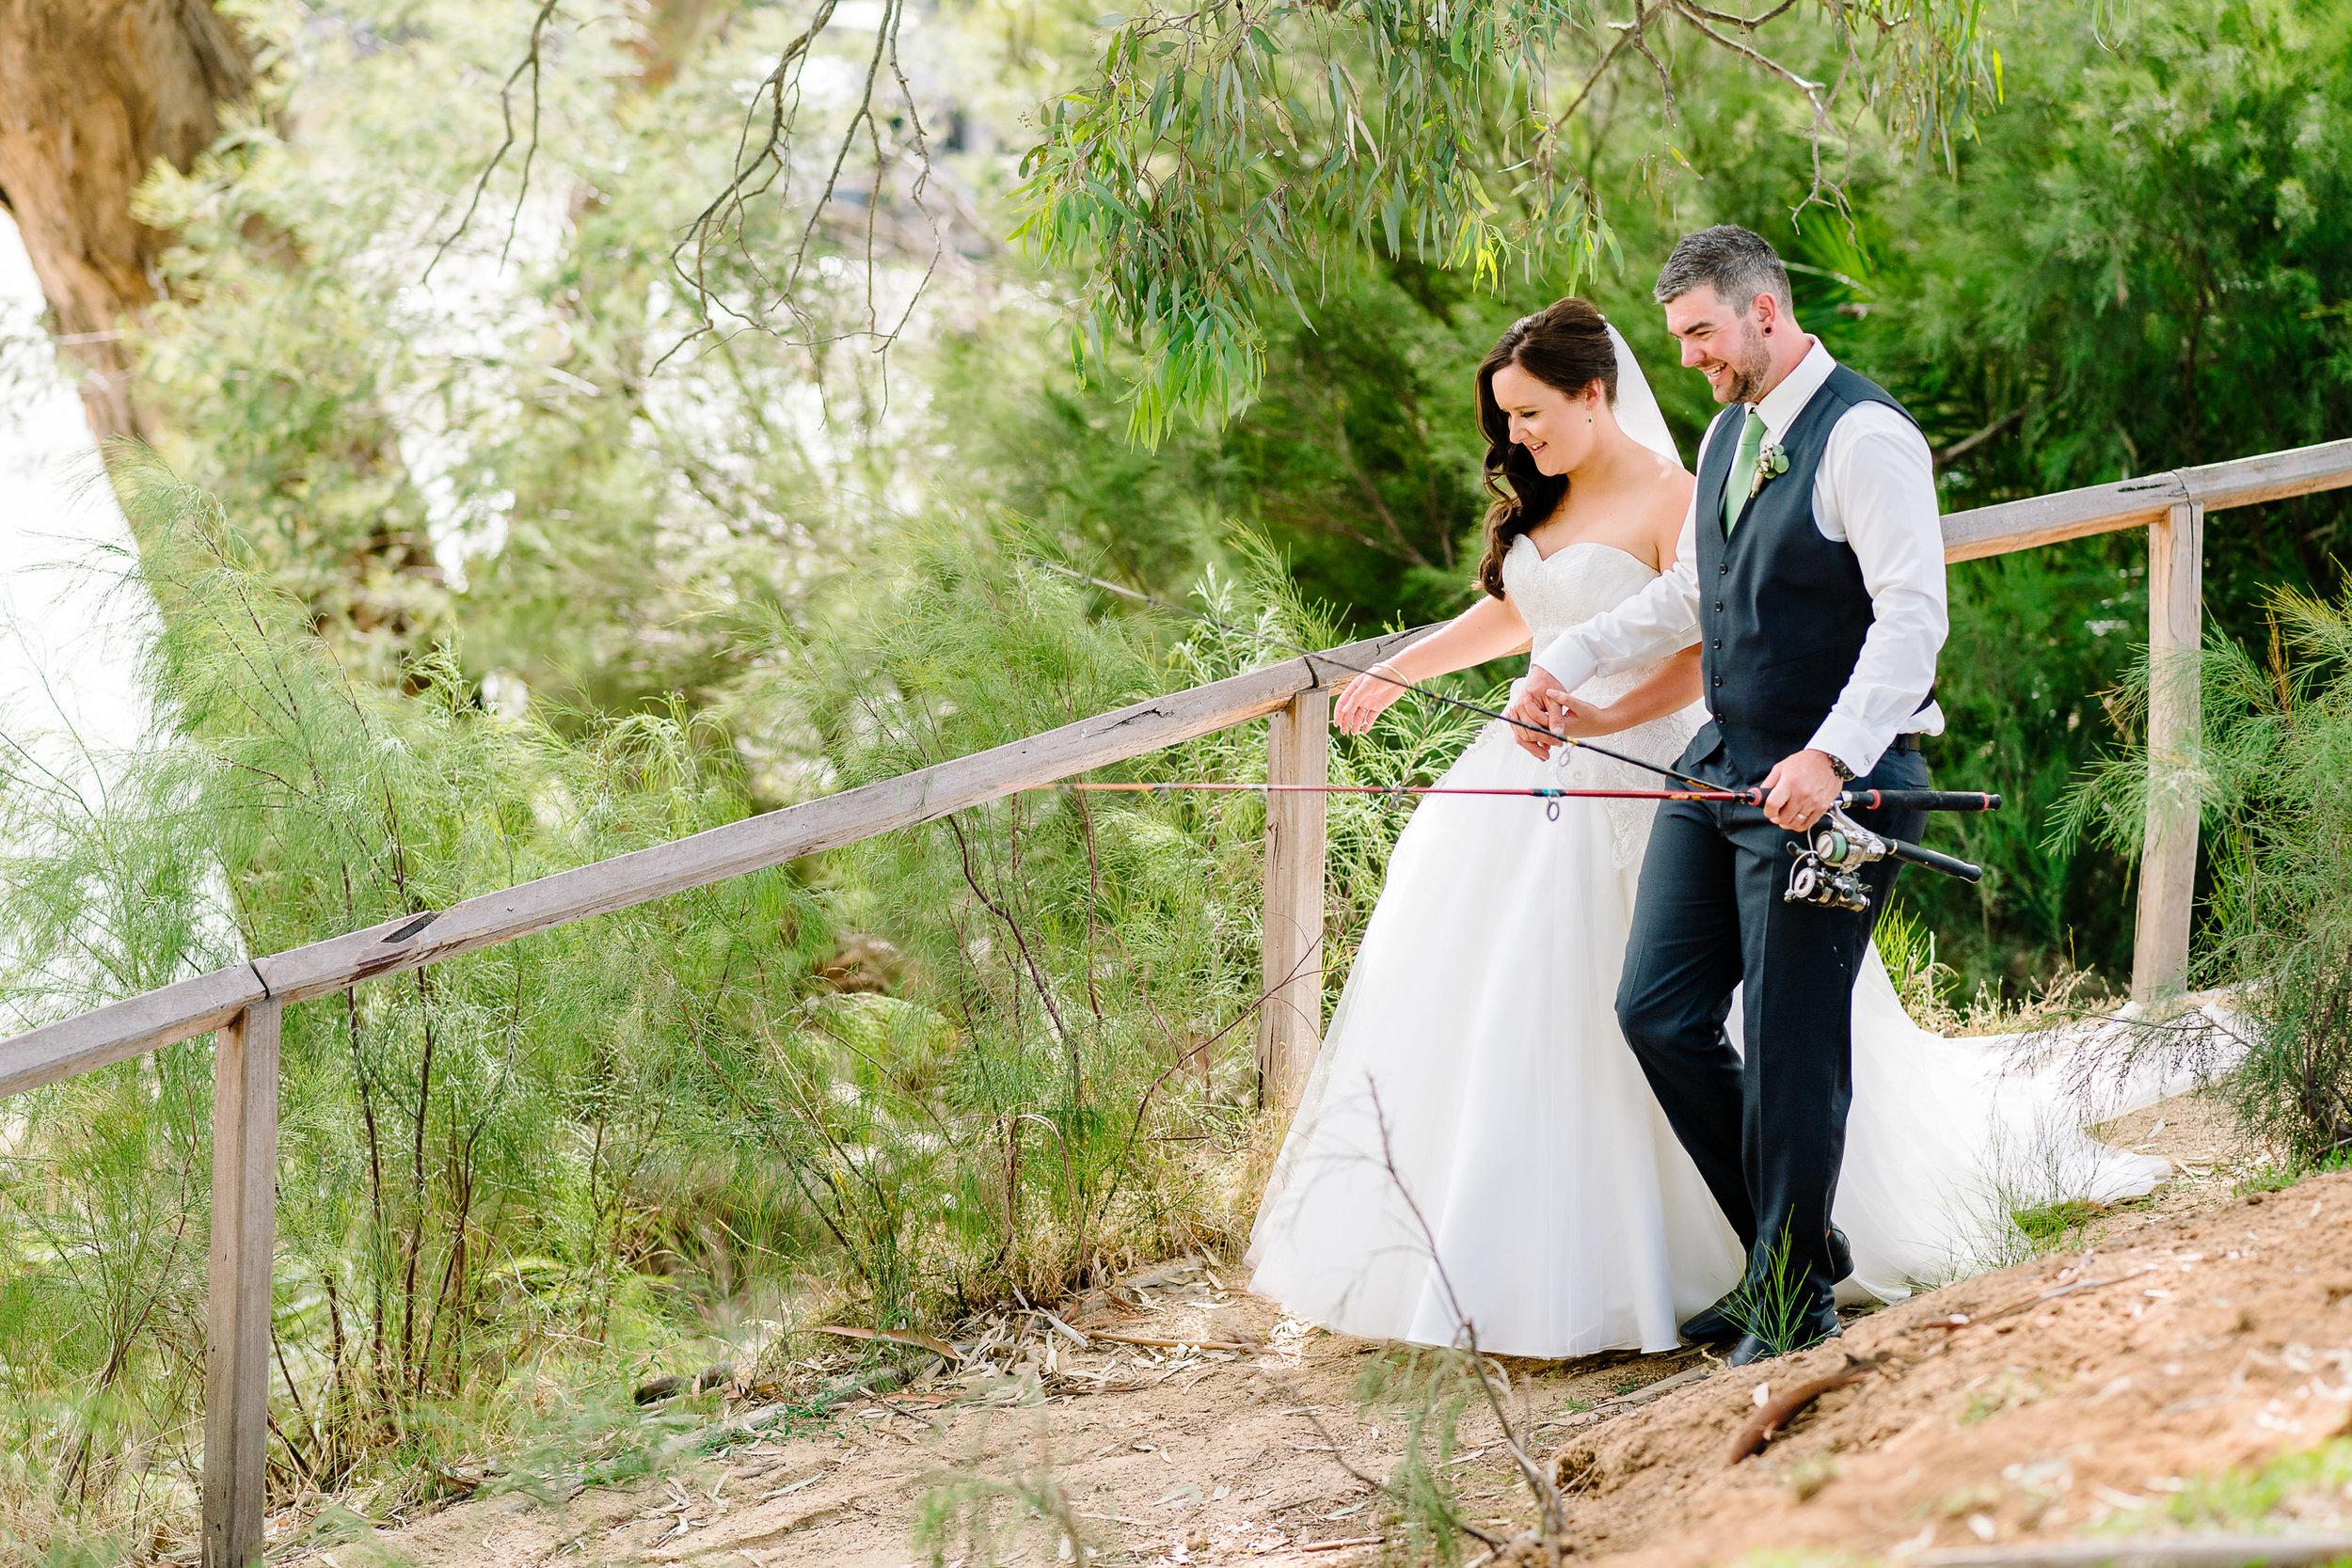 Justin_Jim_Echuca_Wedding_Photography_Tindarra-221.JPG